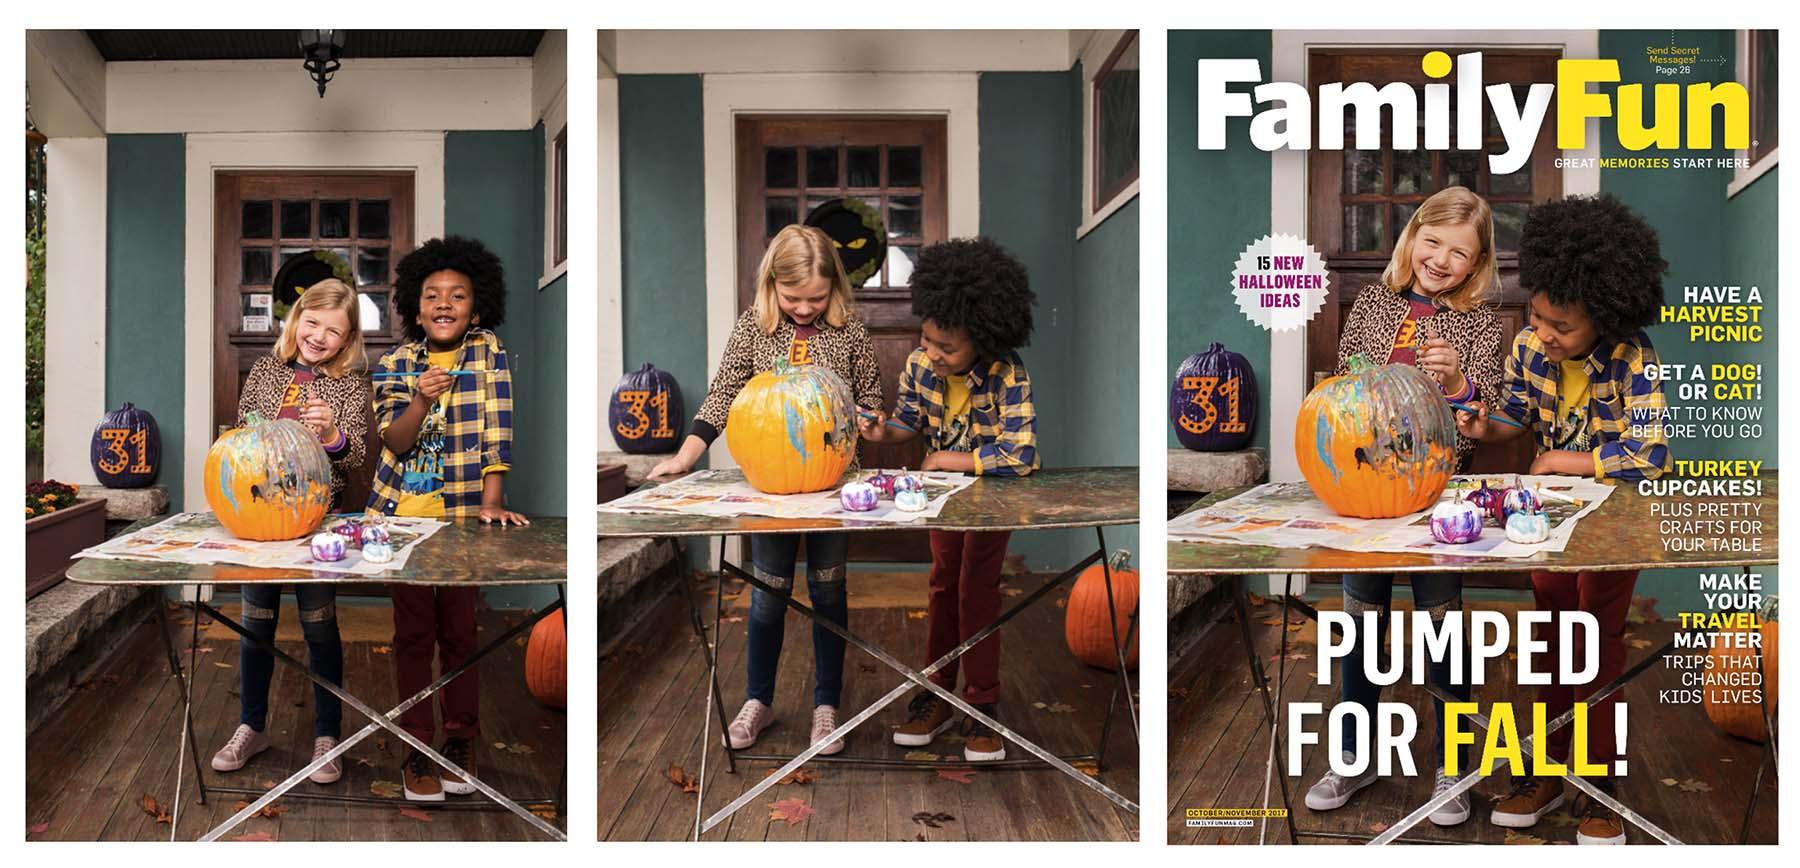 Pumpkincover.jpg